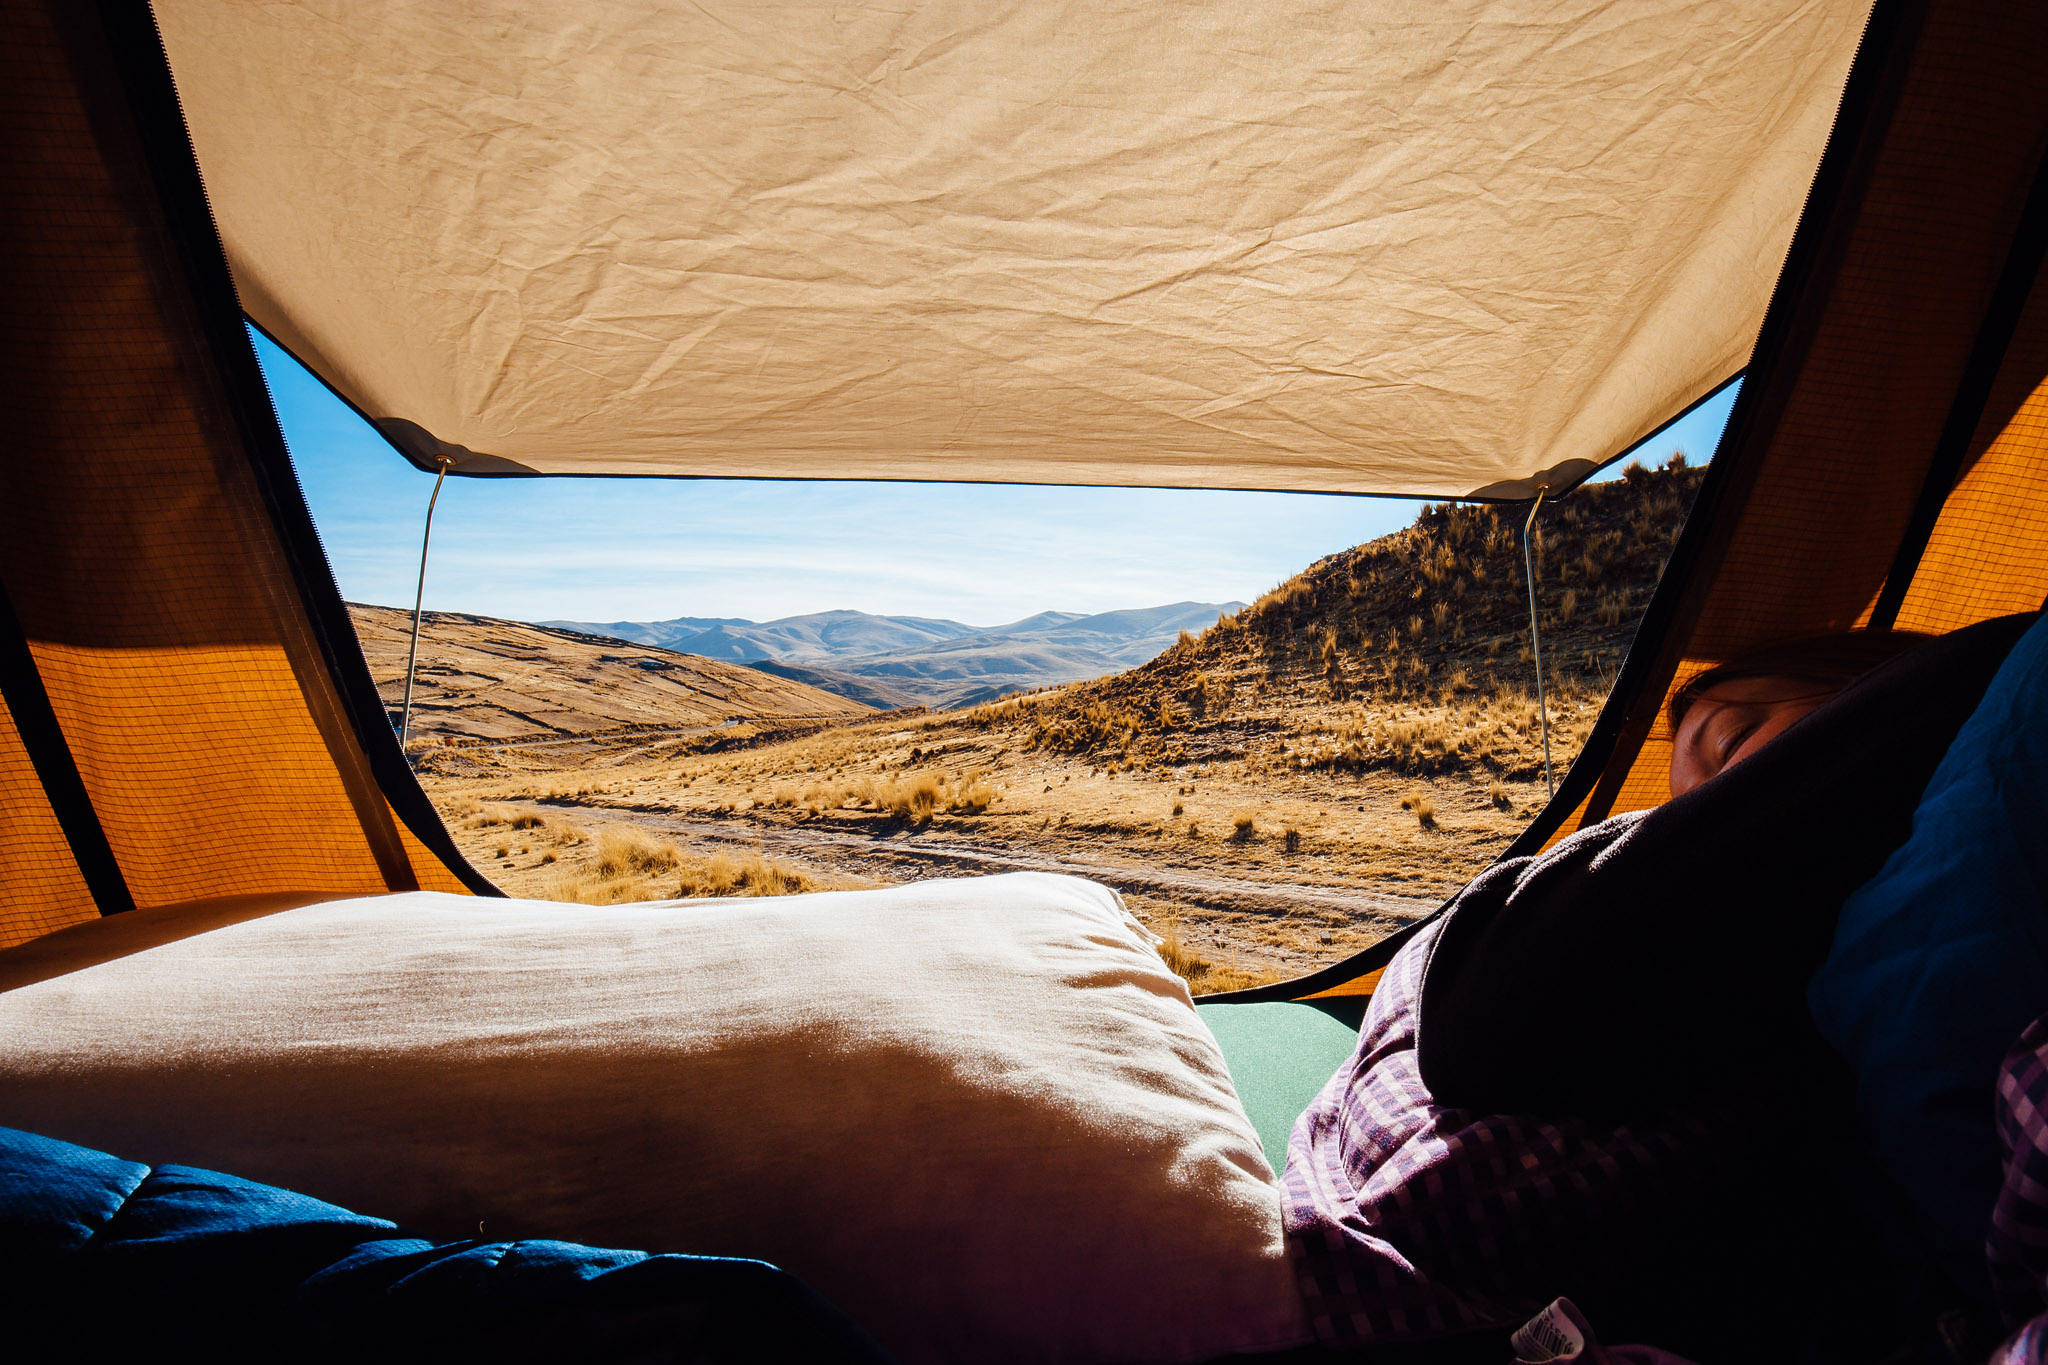 travel-photography-overlanding-apurimac-valley-peru-rooftop-tent-view.jpg